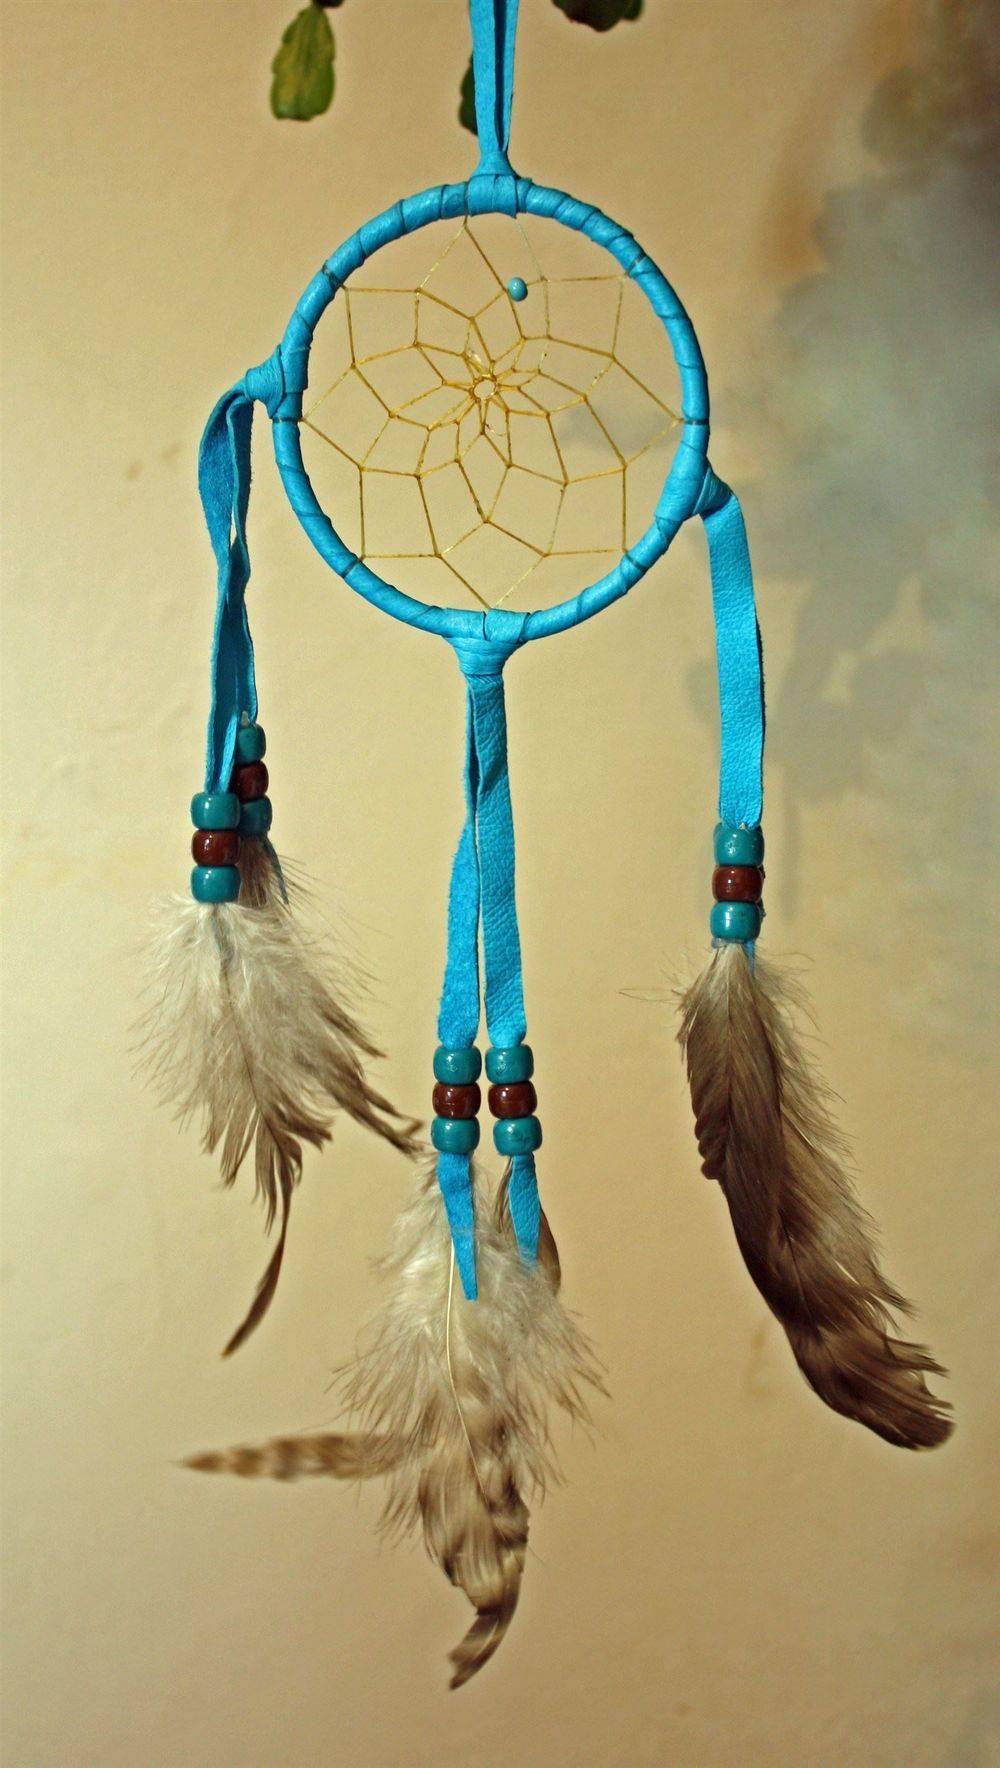 Earrings, Sterlihg Silver, Silver, Feather, Cross, Bone, Turquoise, genuine, native American, American